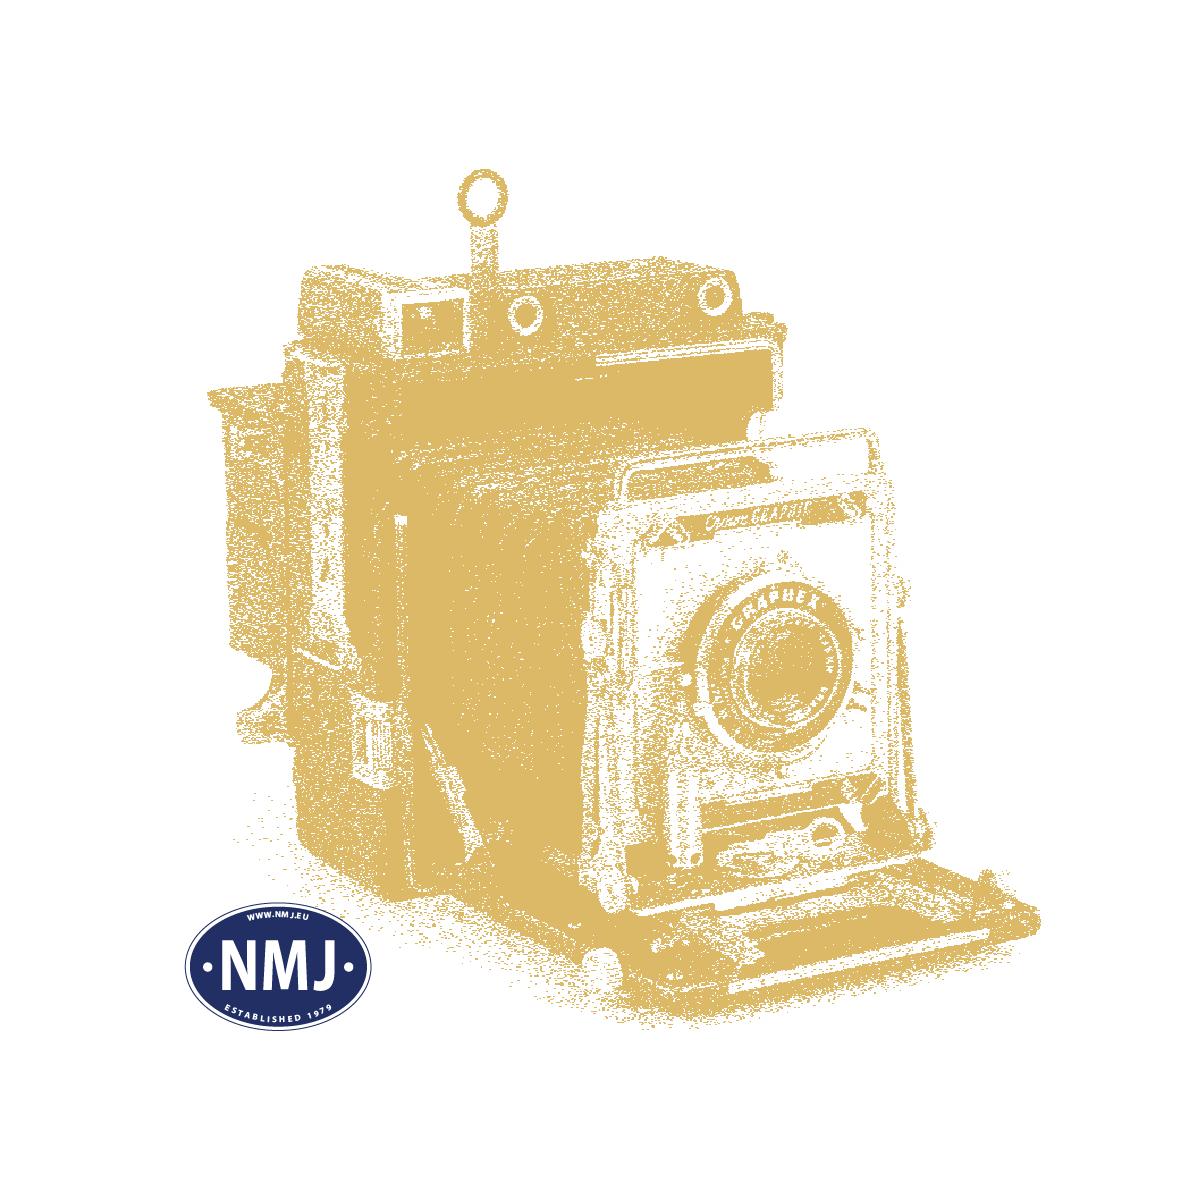 NMJT90203 - NMJ Topline MAV M61.006, DCC m/ Lyd